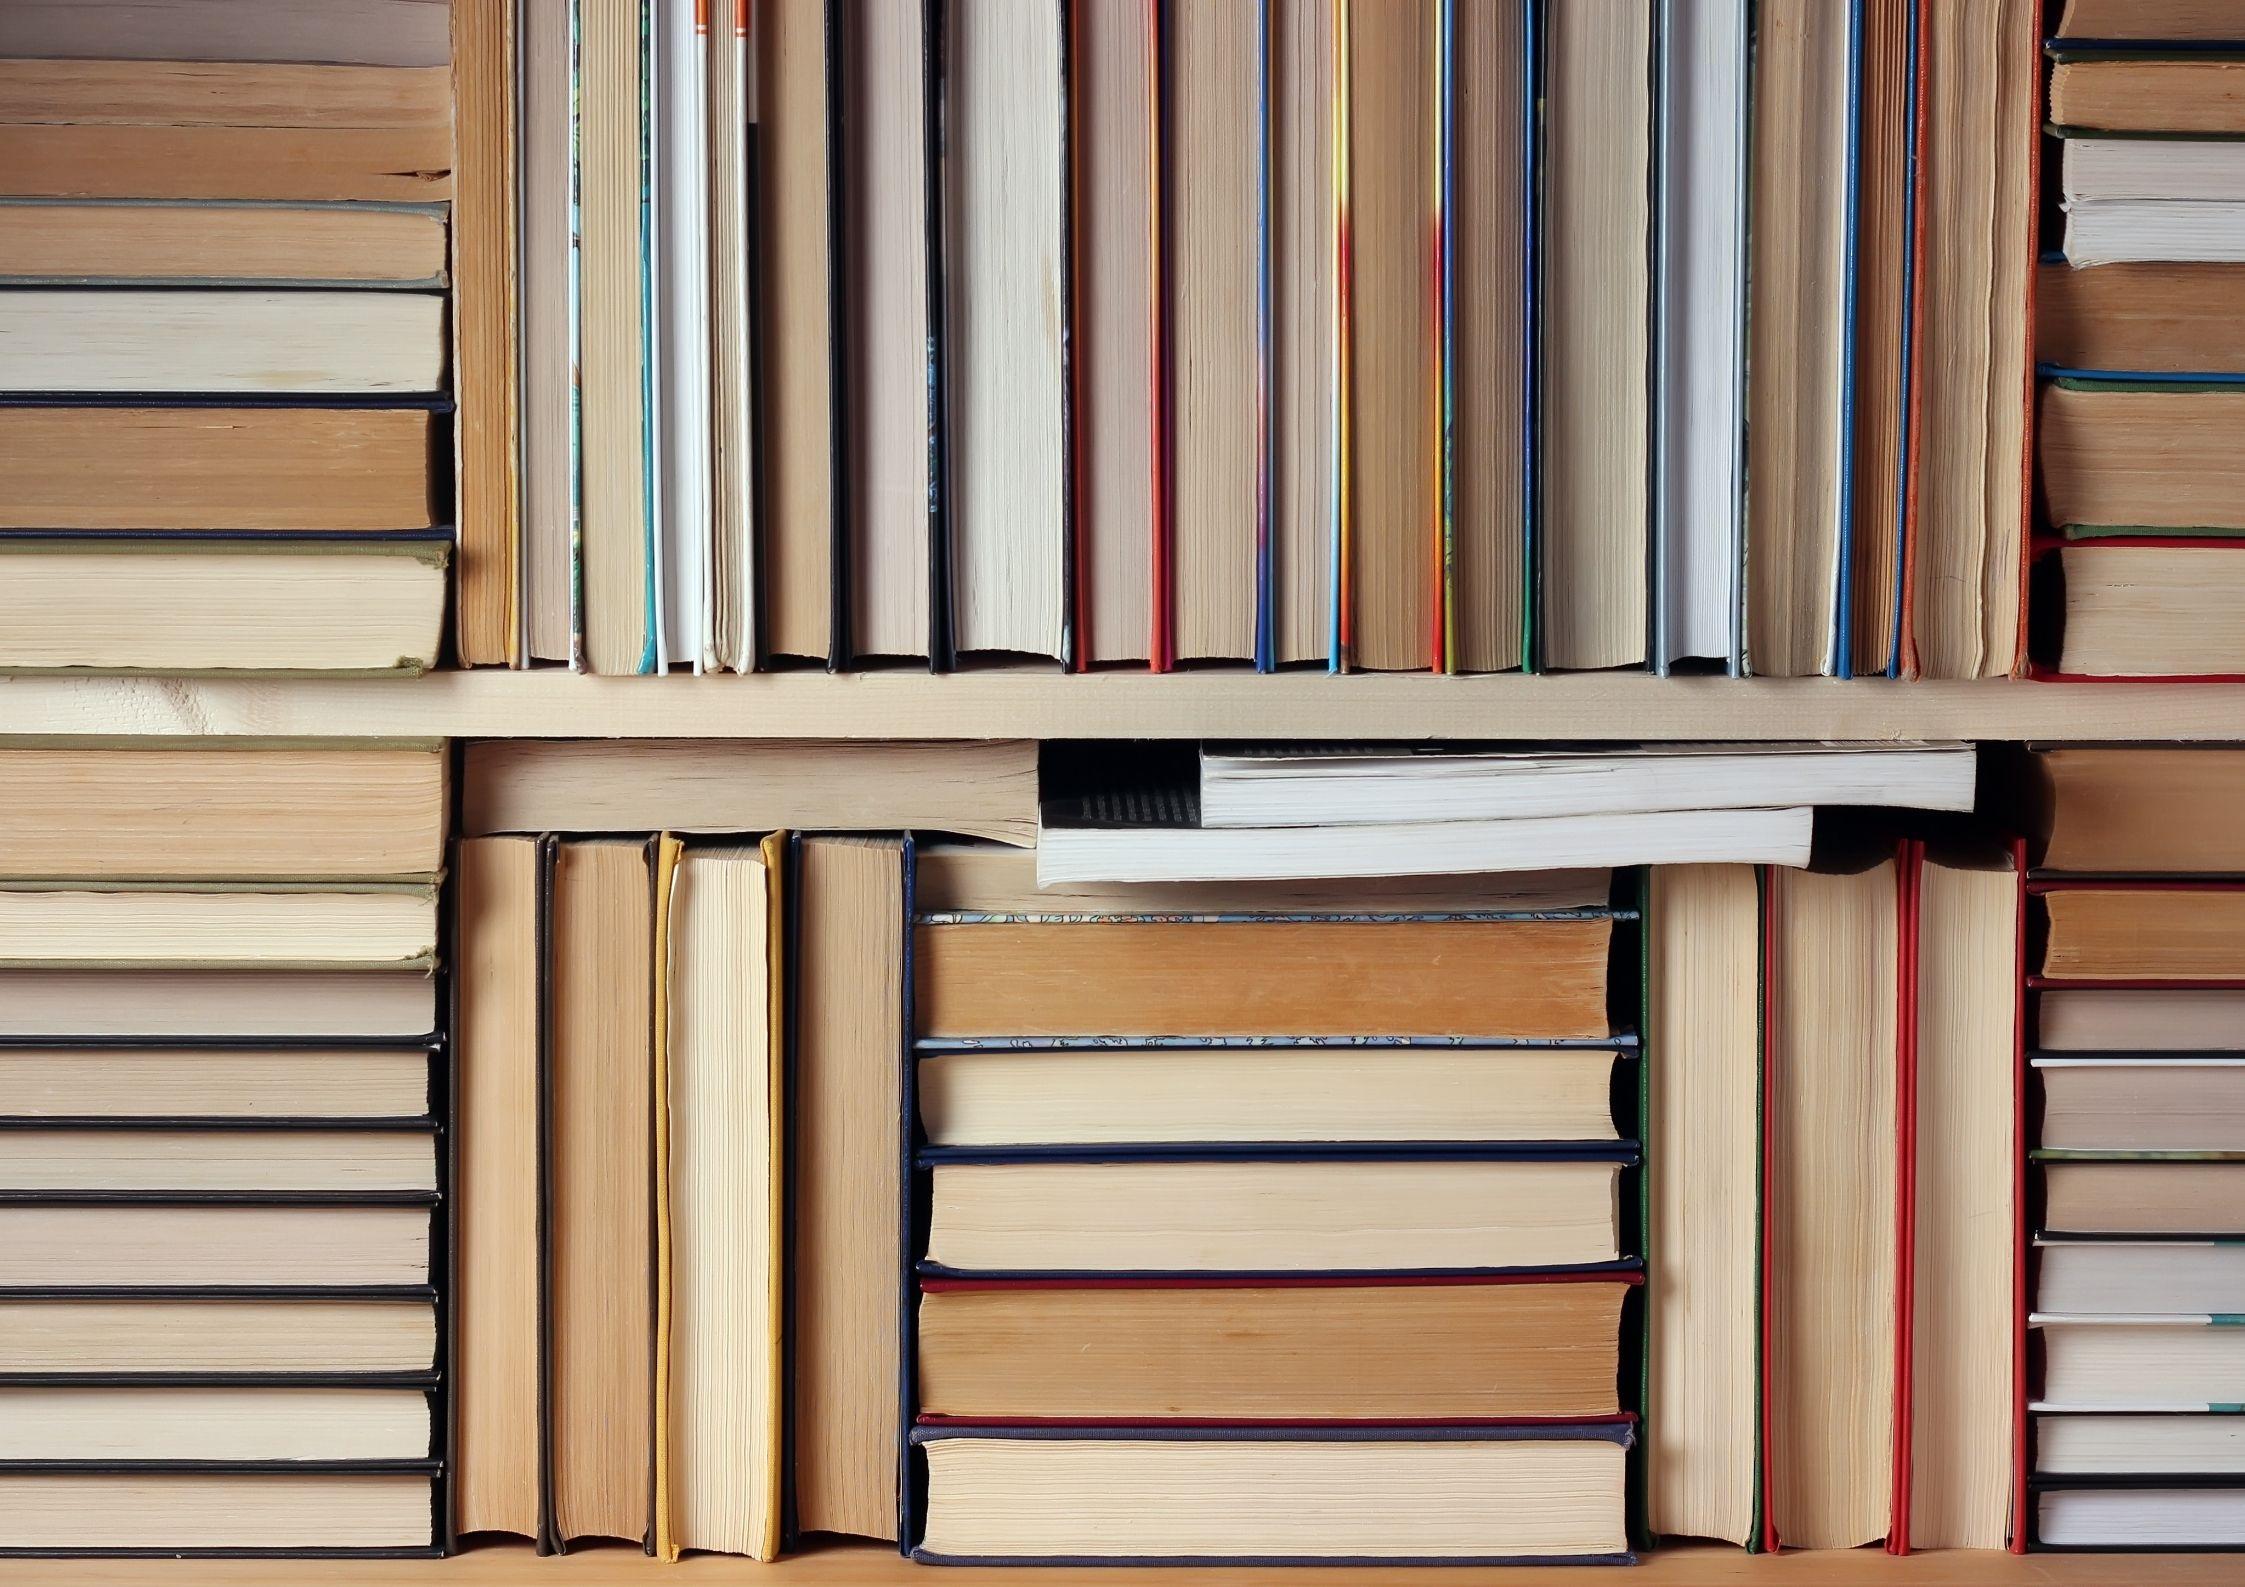 Bøker i en bokhylle